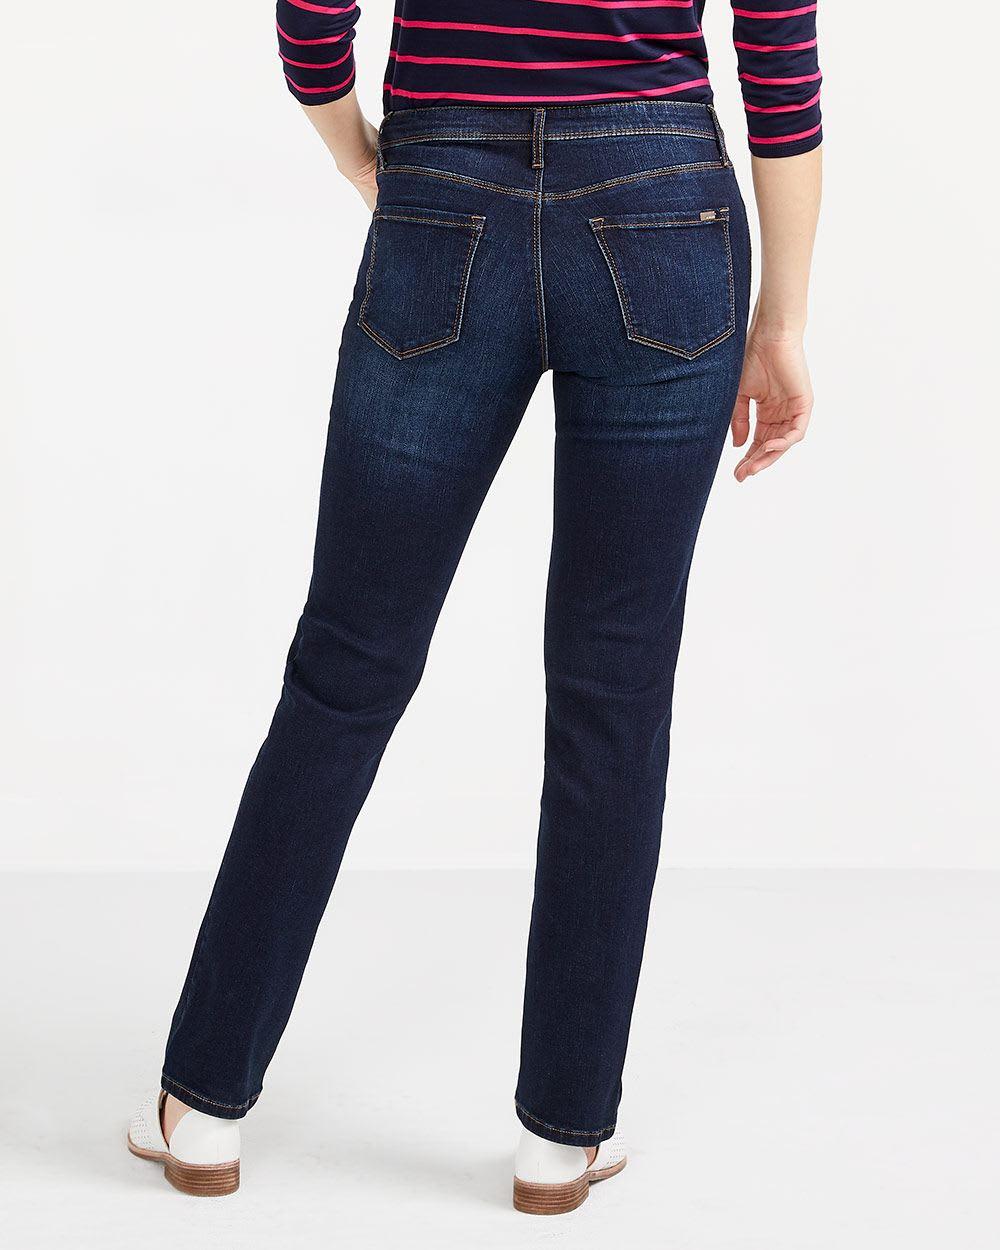 The Insider Dark Wash Straight Leg Jeans